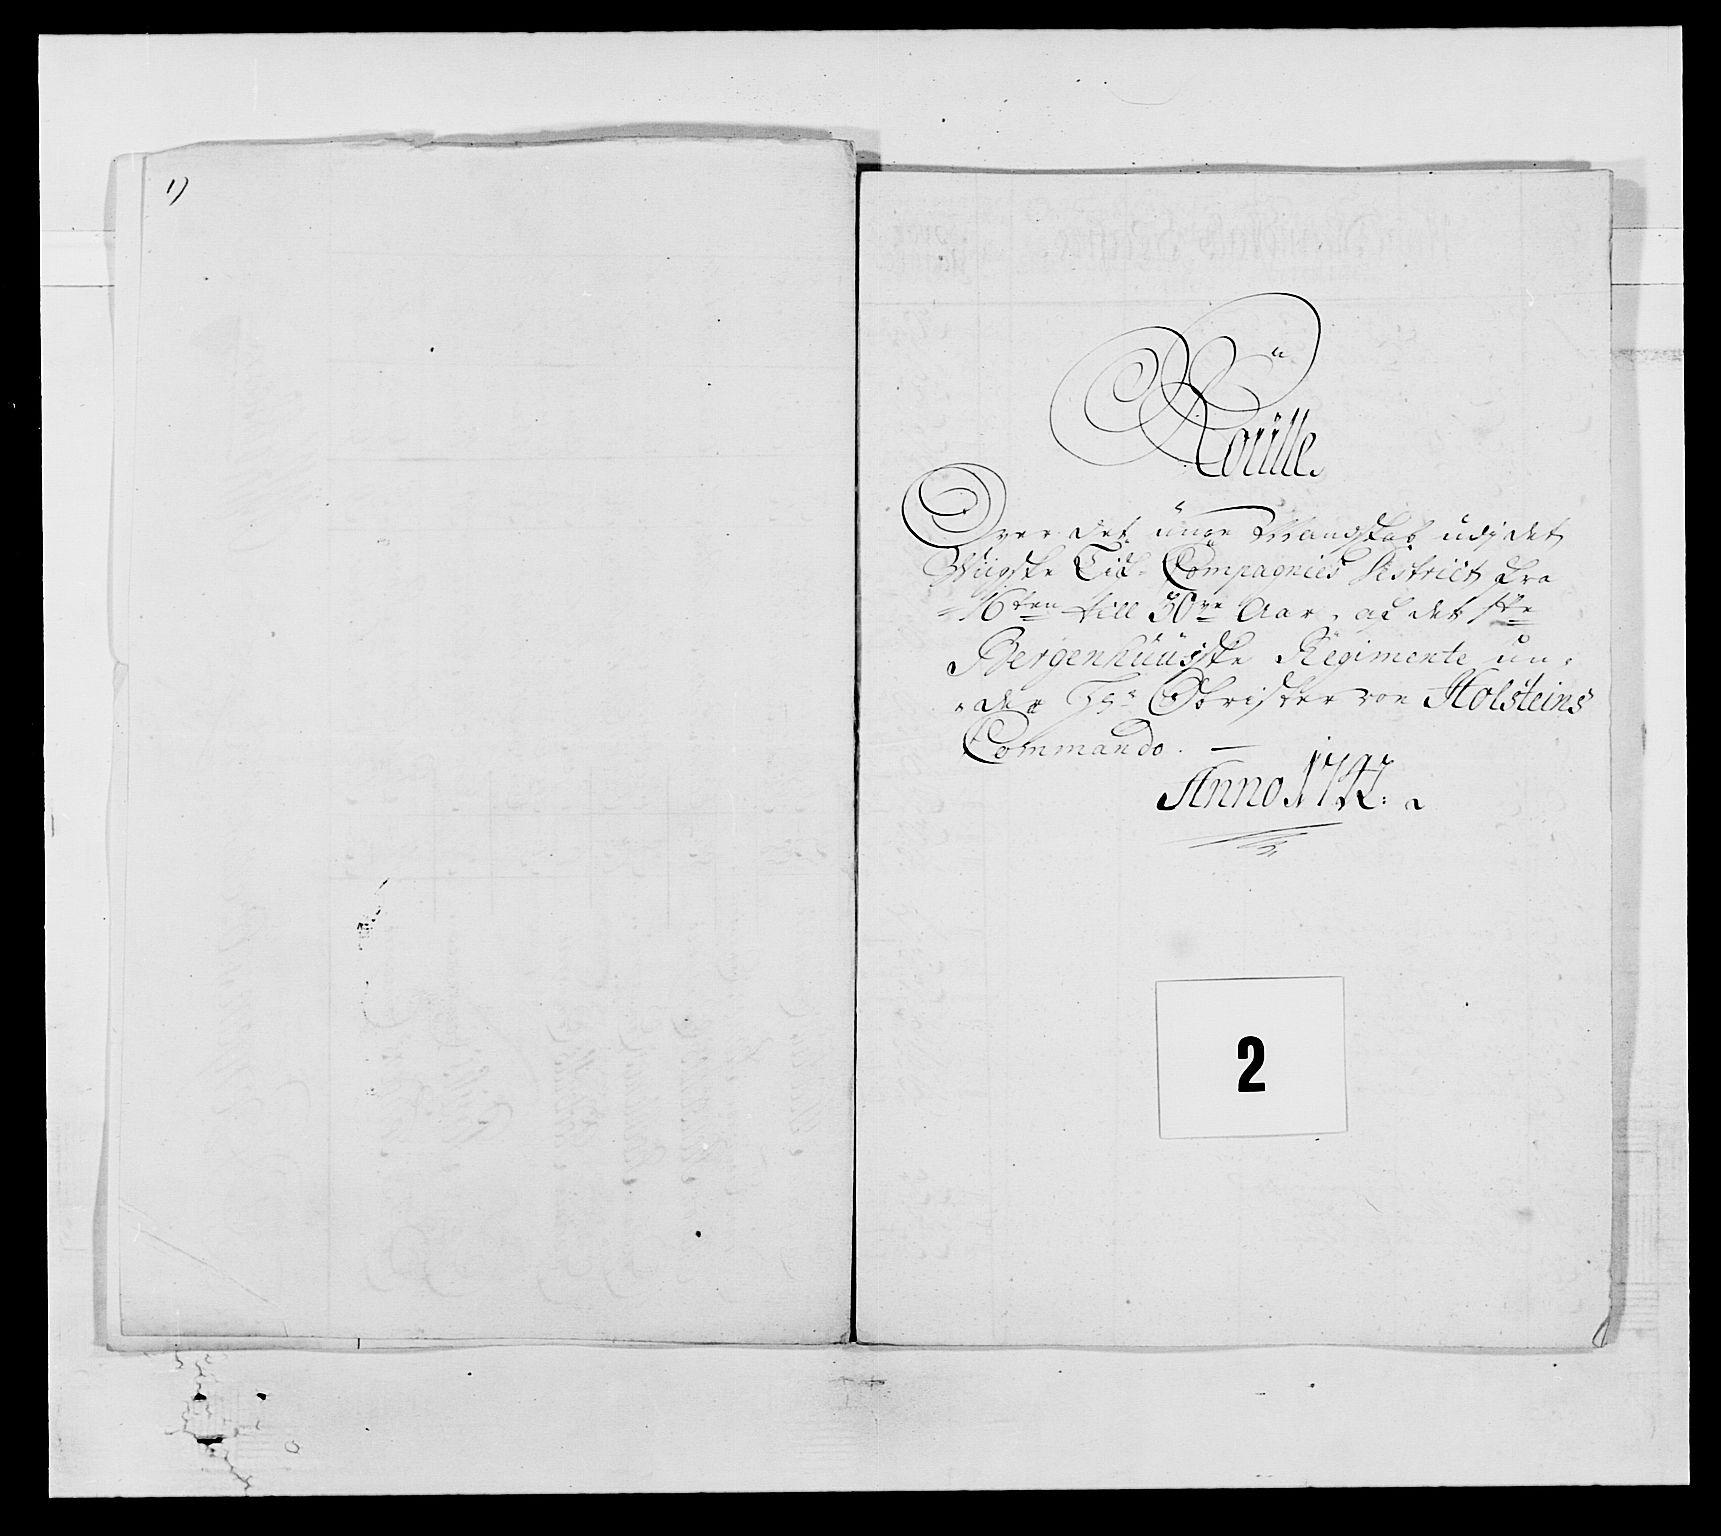 RA, Kommanderende general (KG I) med Det norske krigsdirektorium, E/Ea/L0517: 1. Bergenhusiske regiment, 1742-1756, s. 8